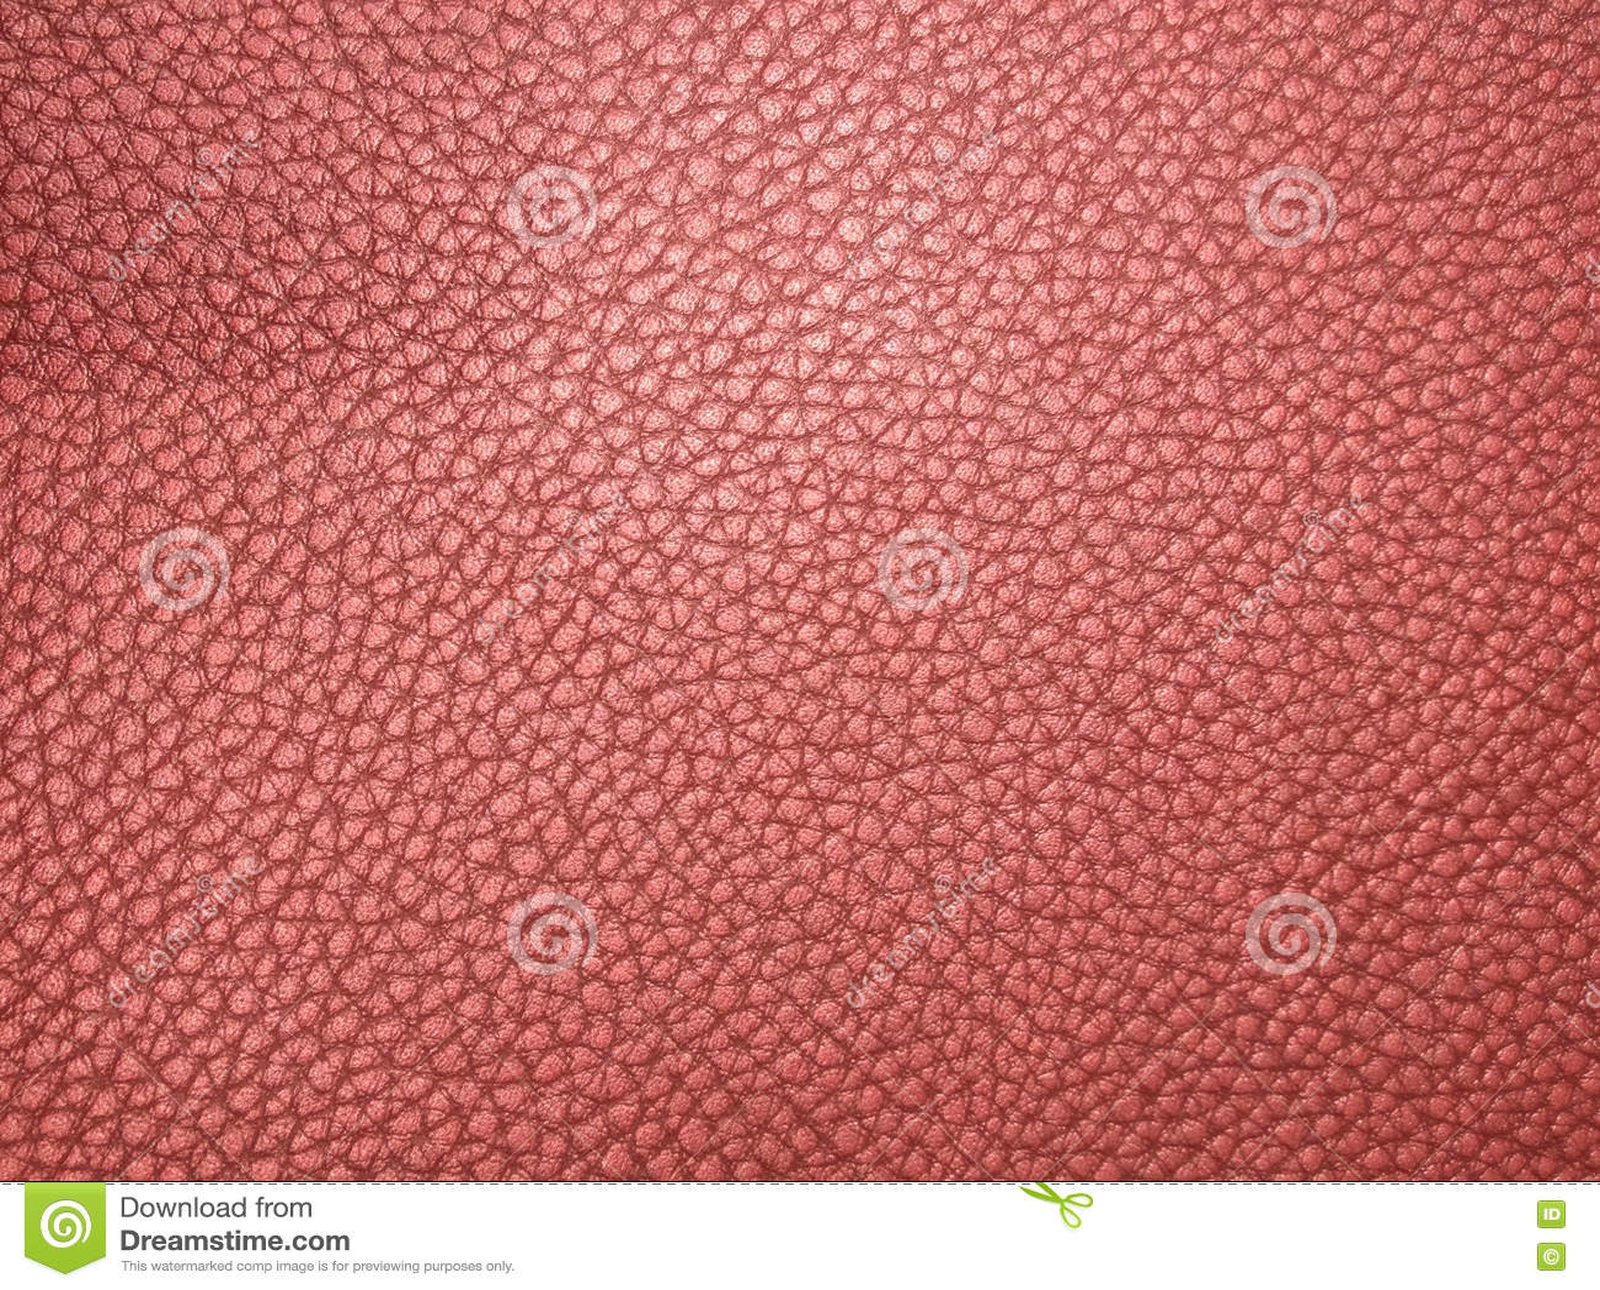 Кожаный цвет кармина как текстура предпосылки